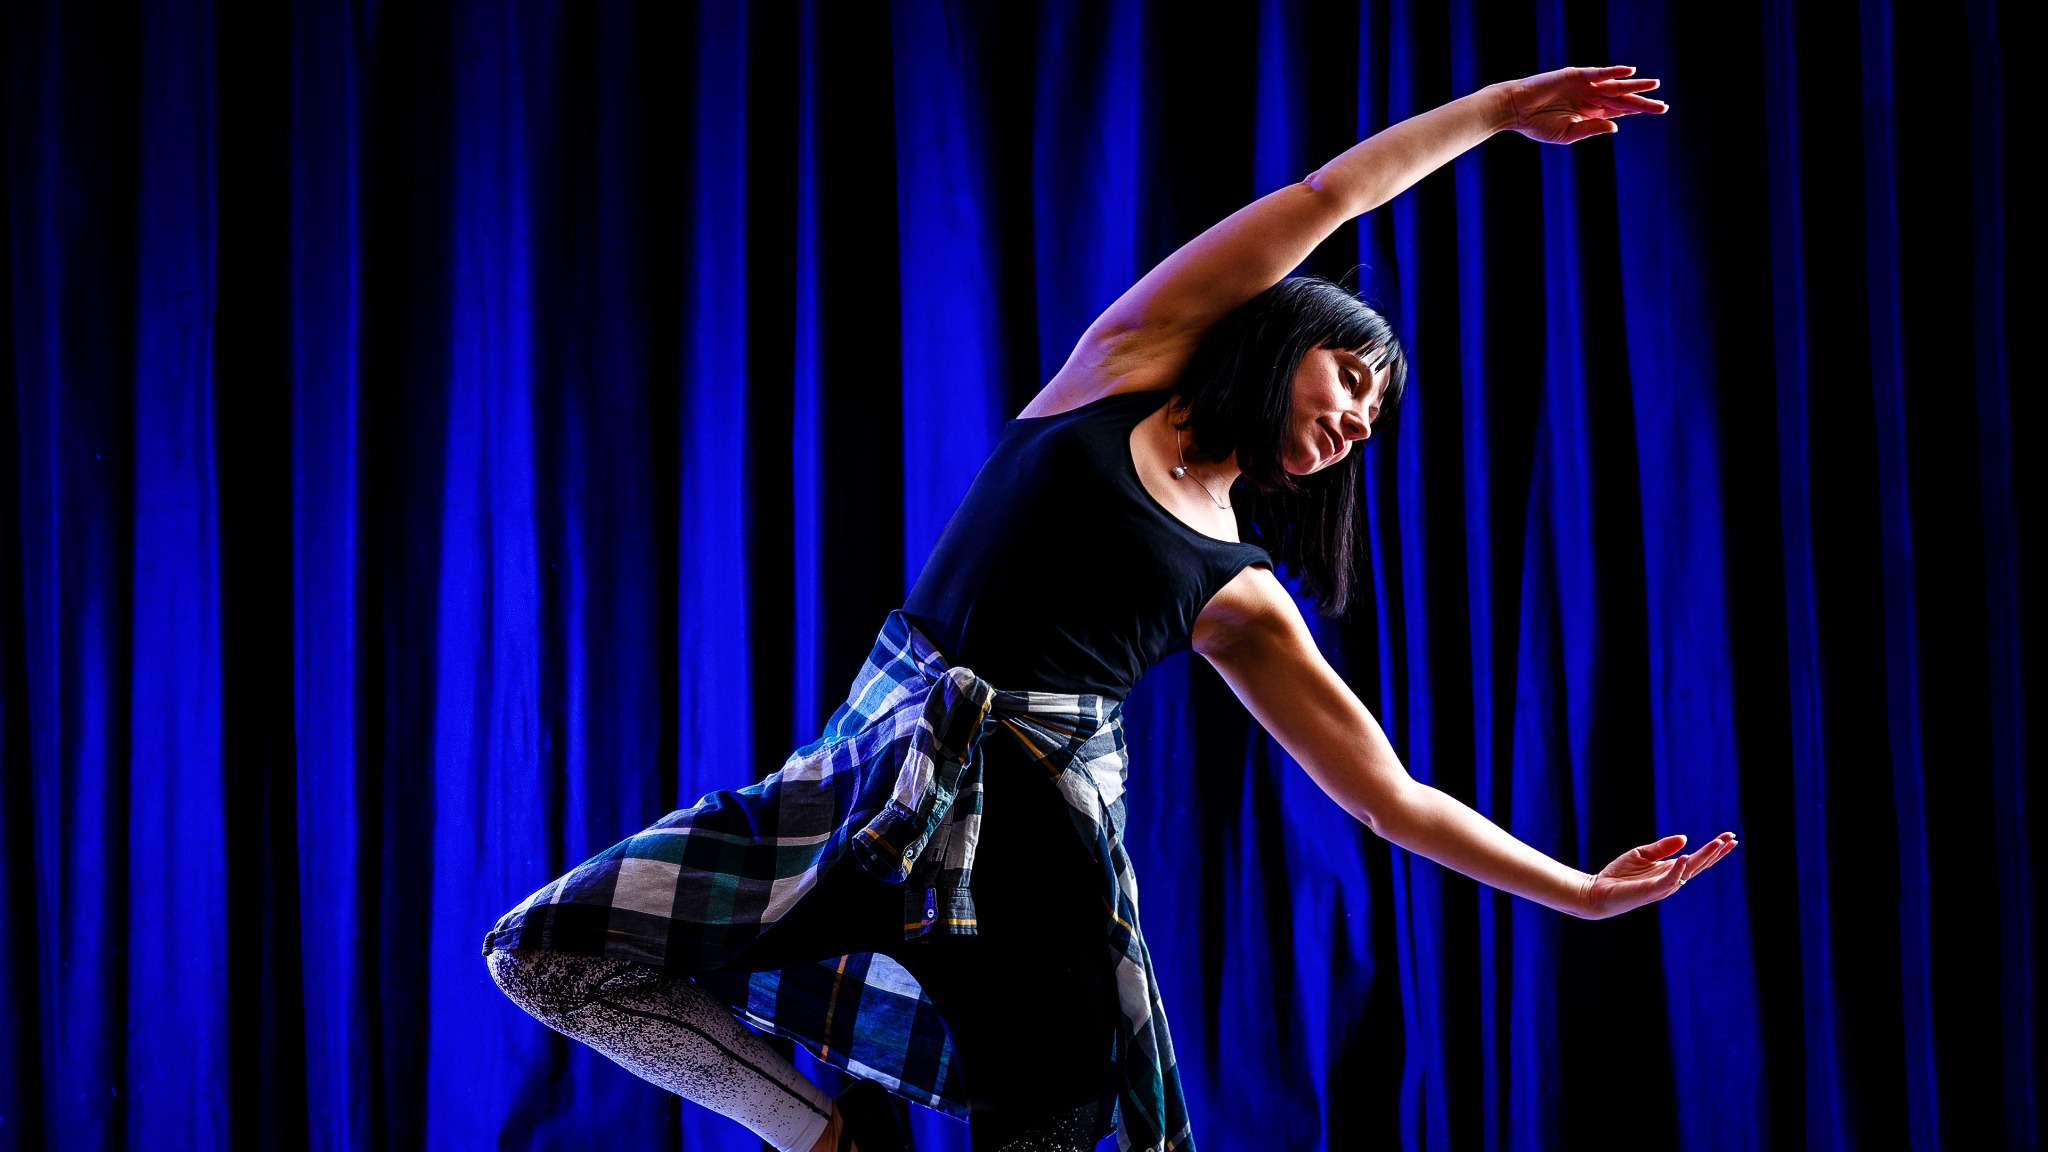 mörkhårig kvinna i danspose mot blå bakgrund